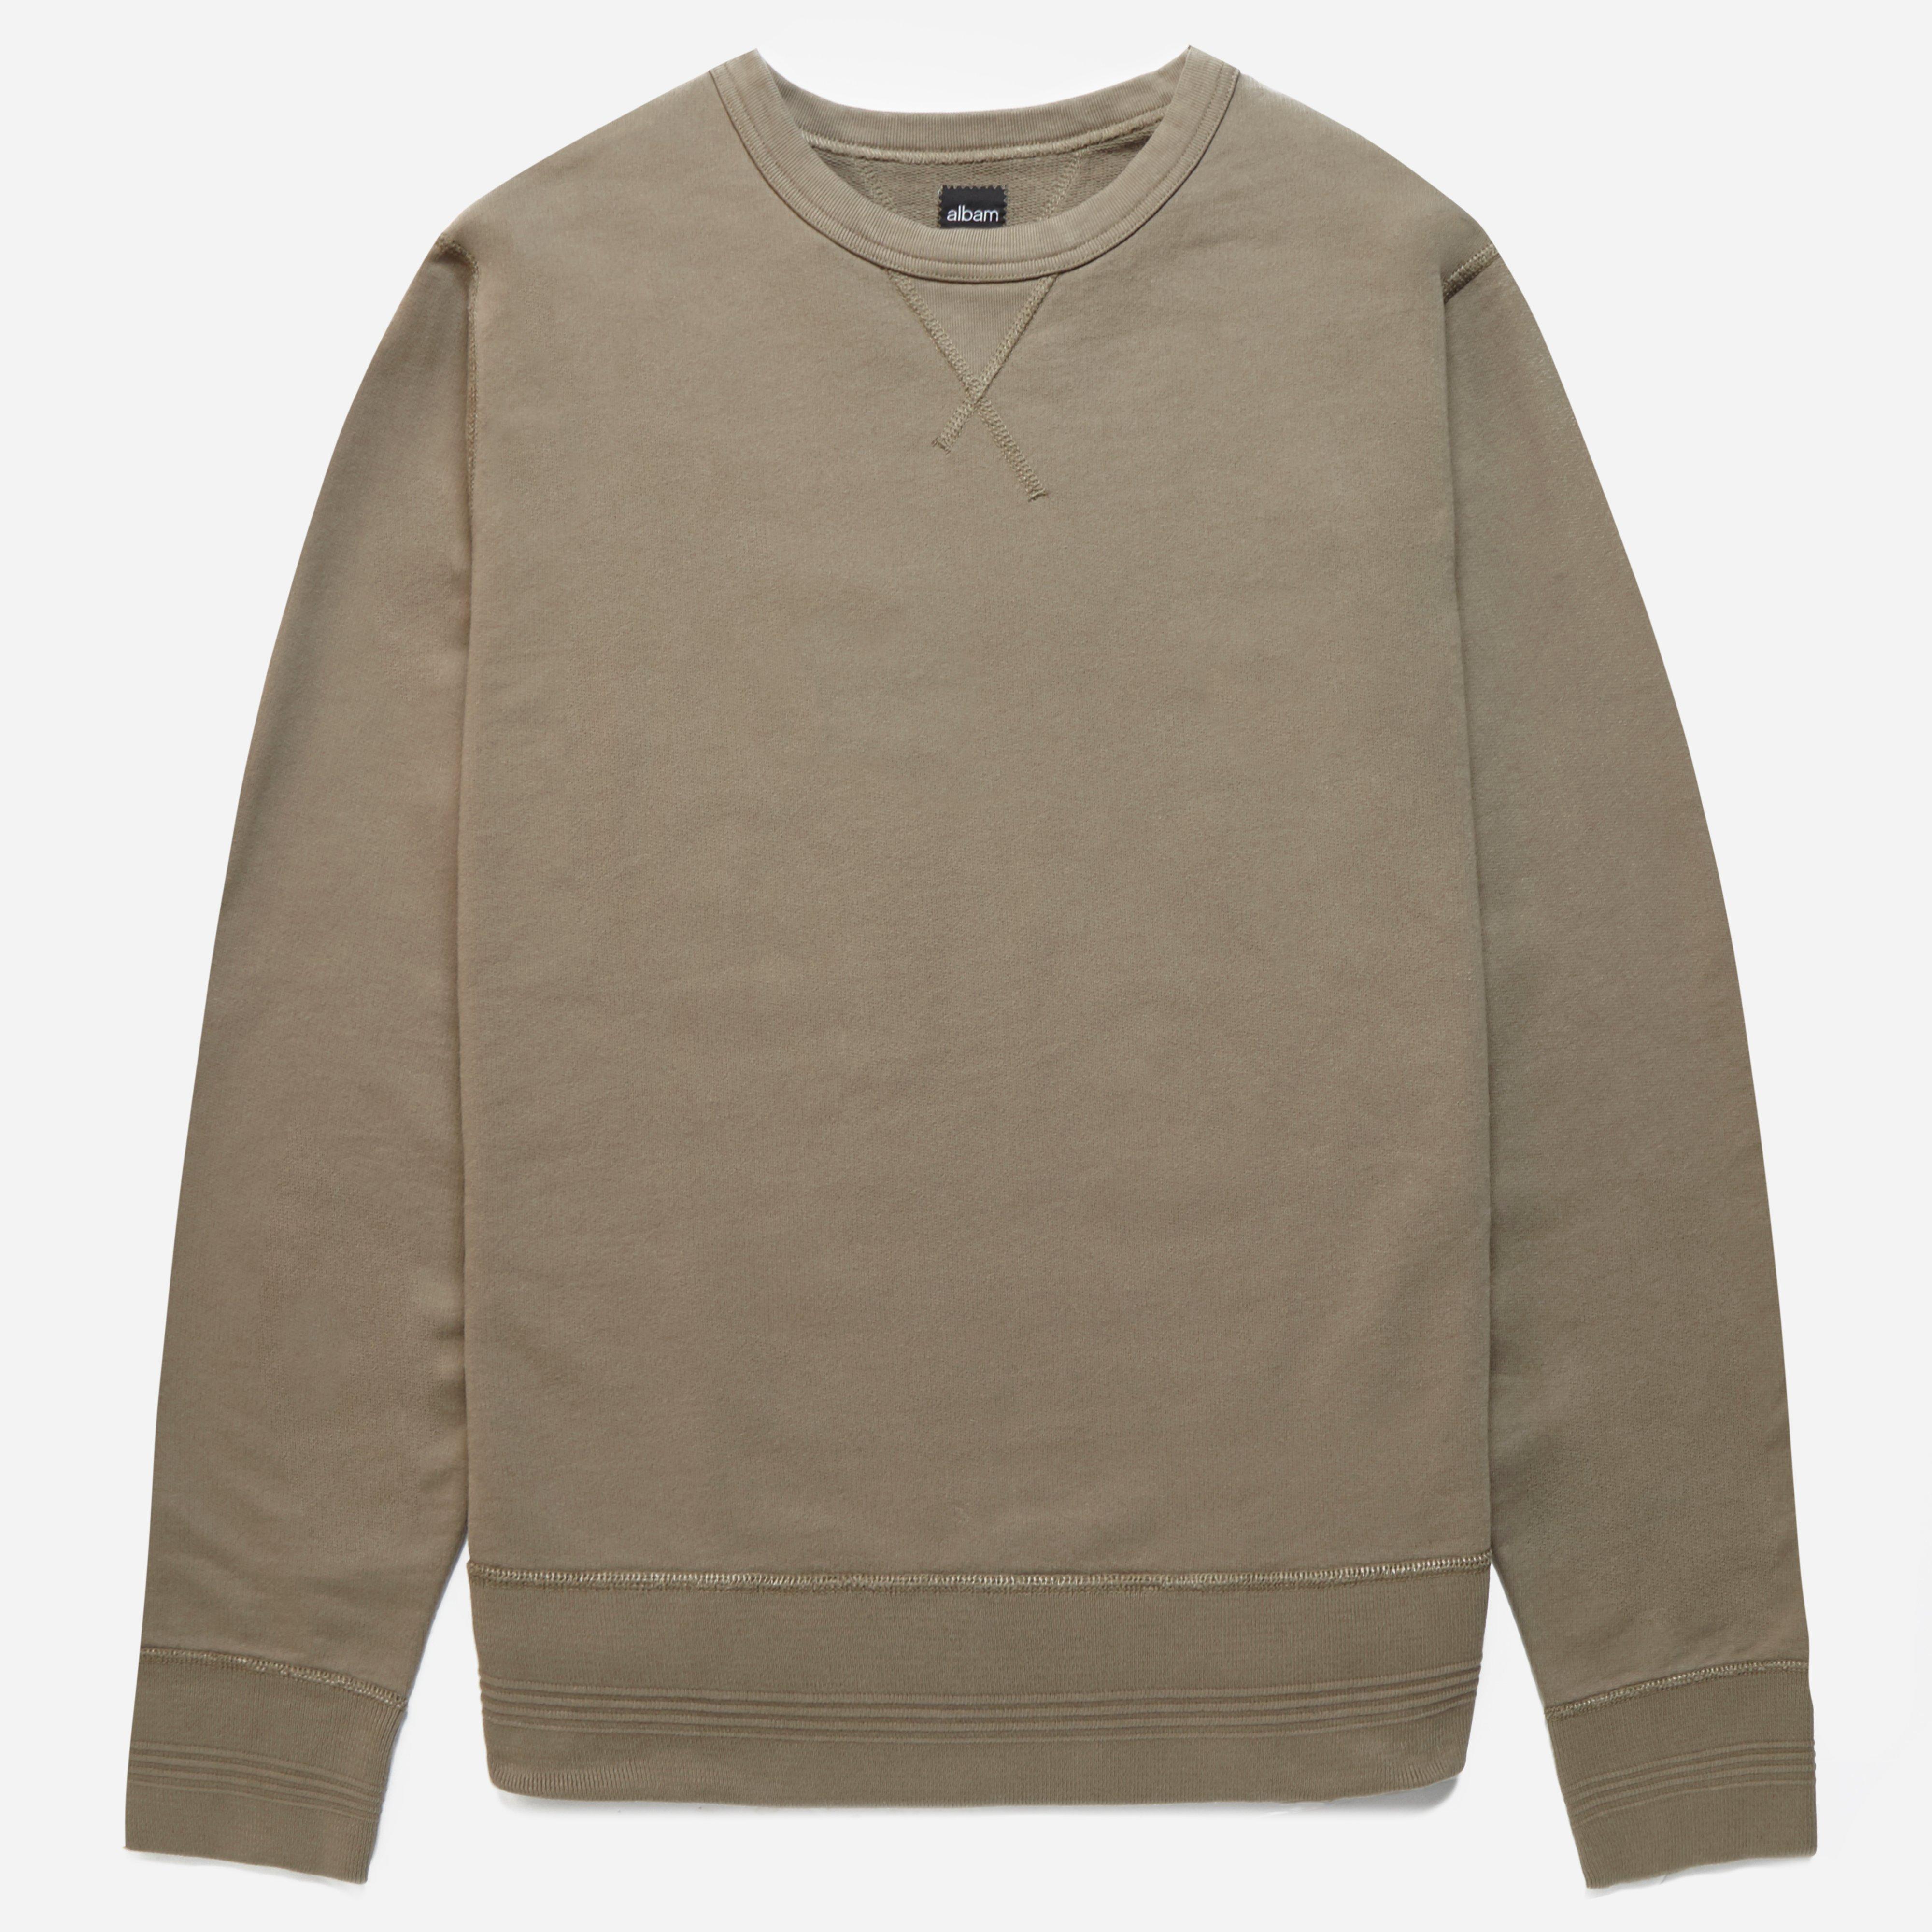 Albam Garment Dye Sweatshirt